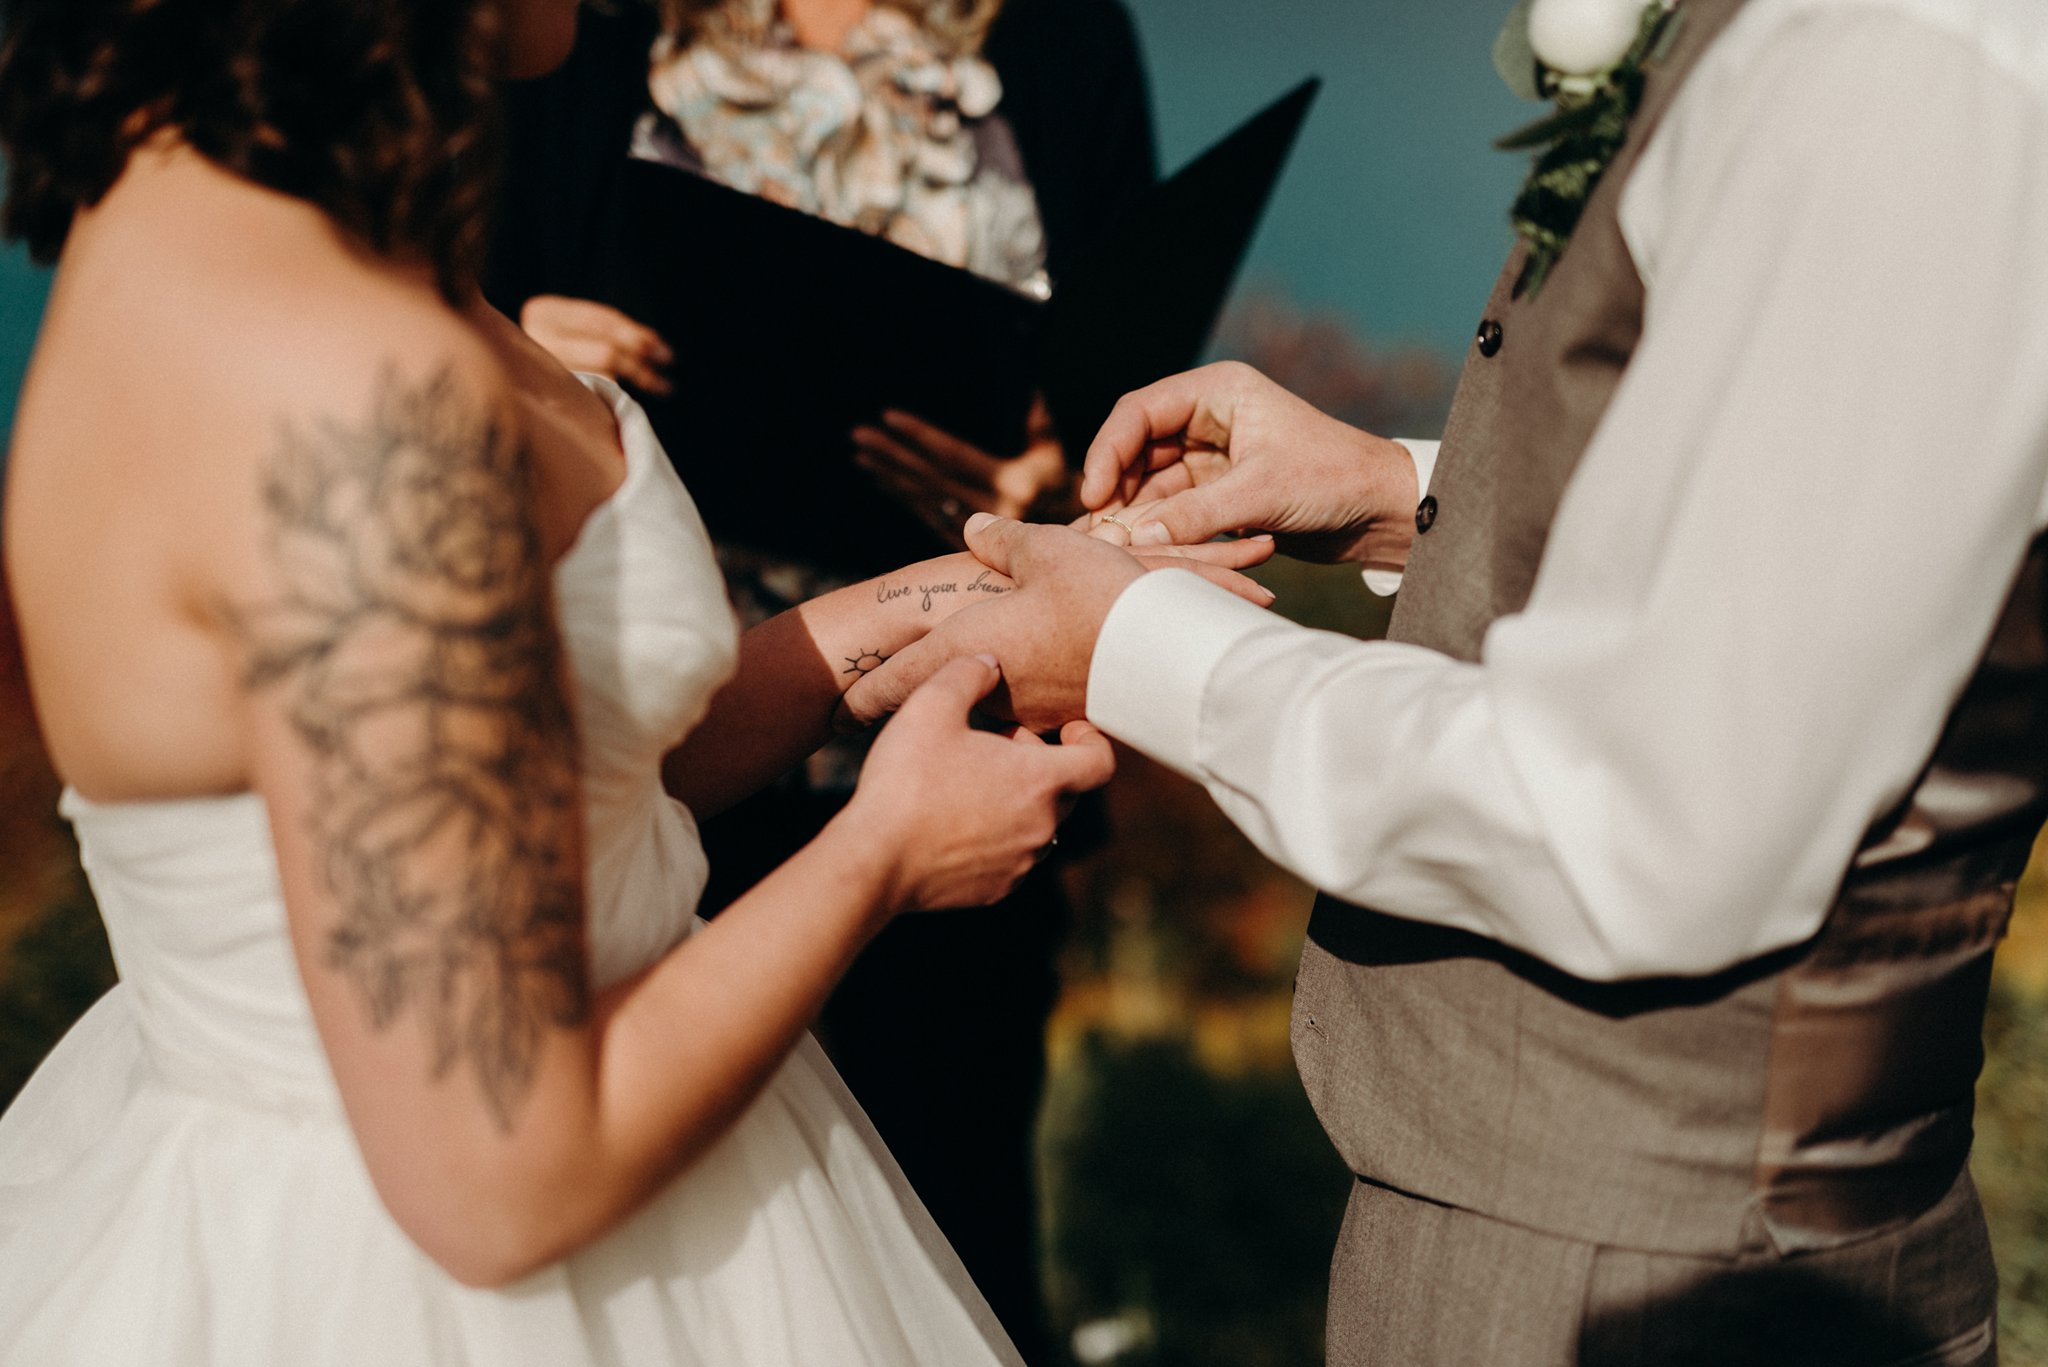 kaihla_tonai_intimate_wedding_elopement_photographer_6894.jpg